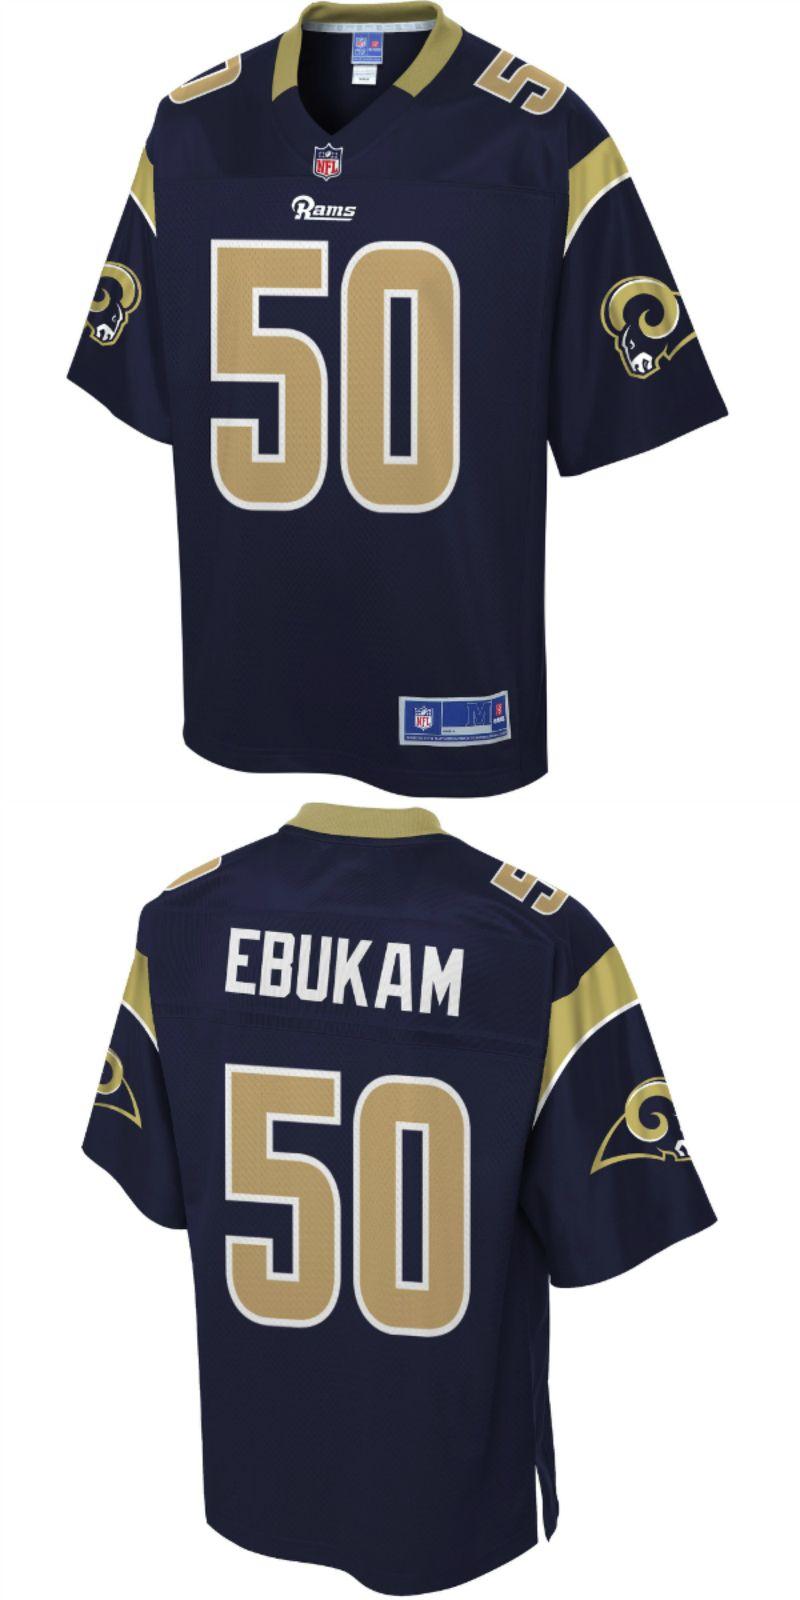 new arrival f867c 76d72 UP TO 70% OFF. Samson Ebukam Los Angeles Rams NFL Pro Line ...